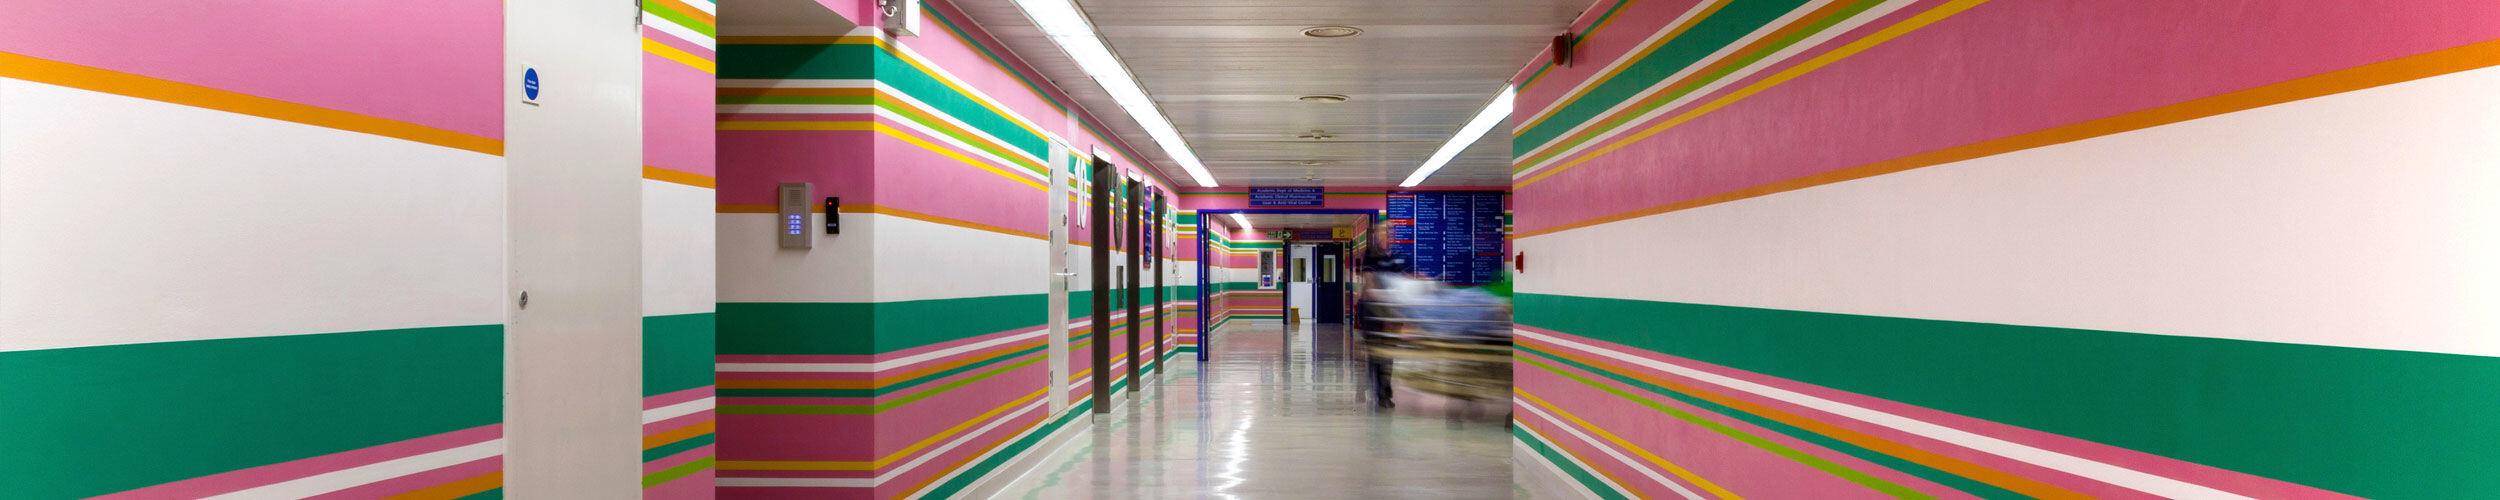 arts hospital